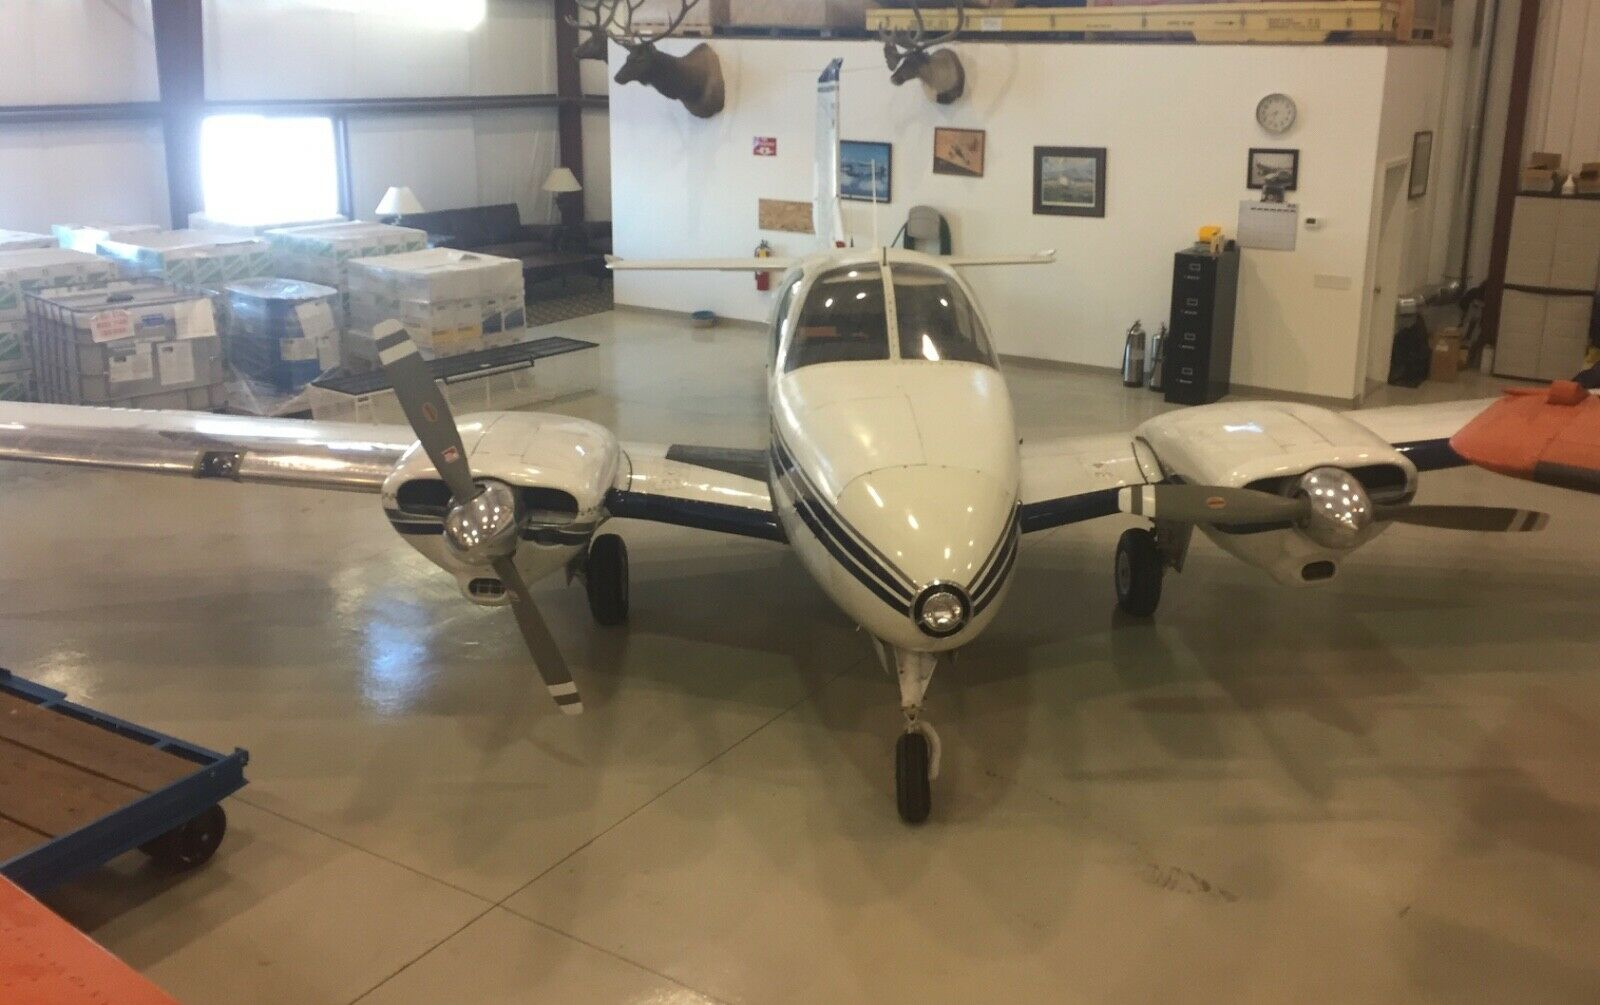 hangared 1959 Beechcraft B95 Travel air Multi Engine aircraft